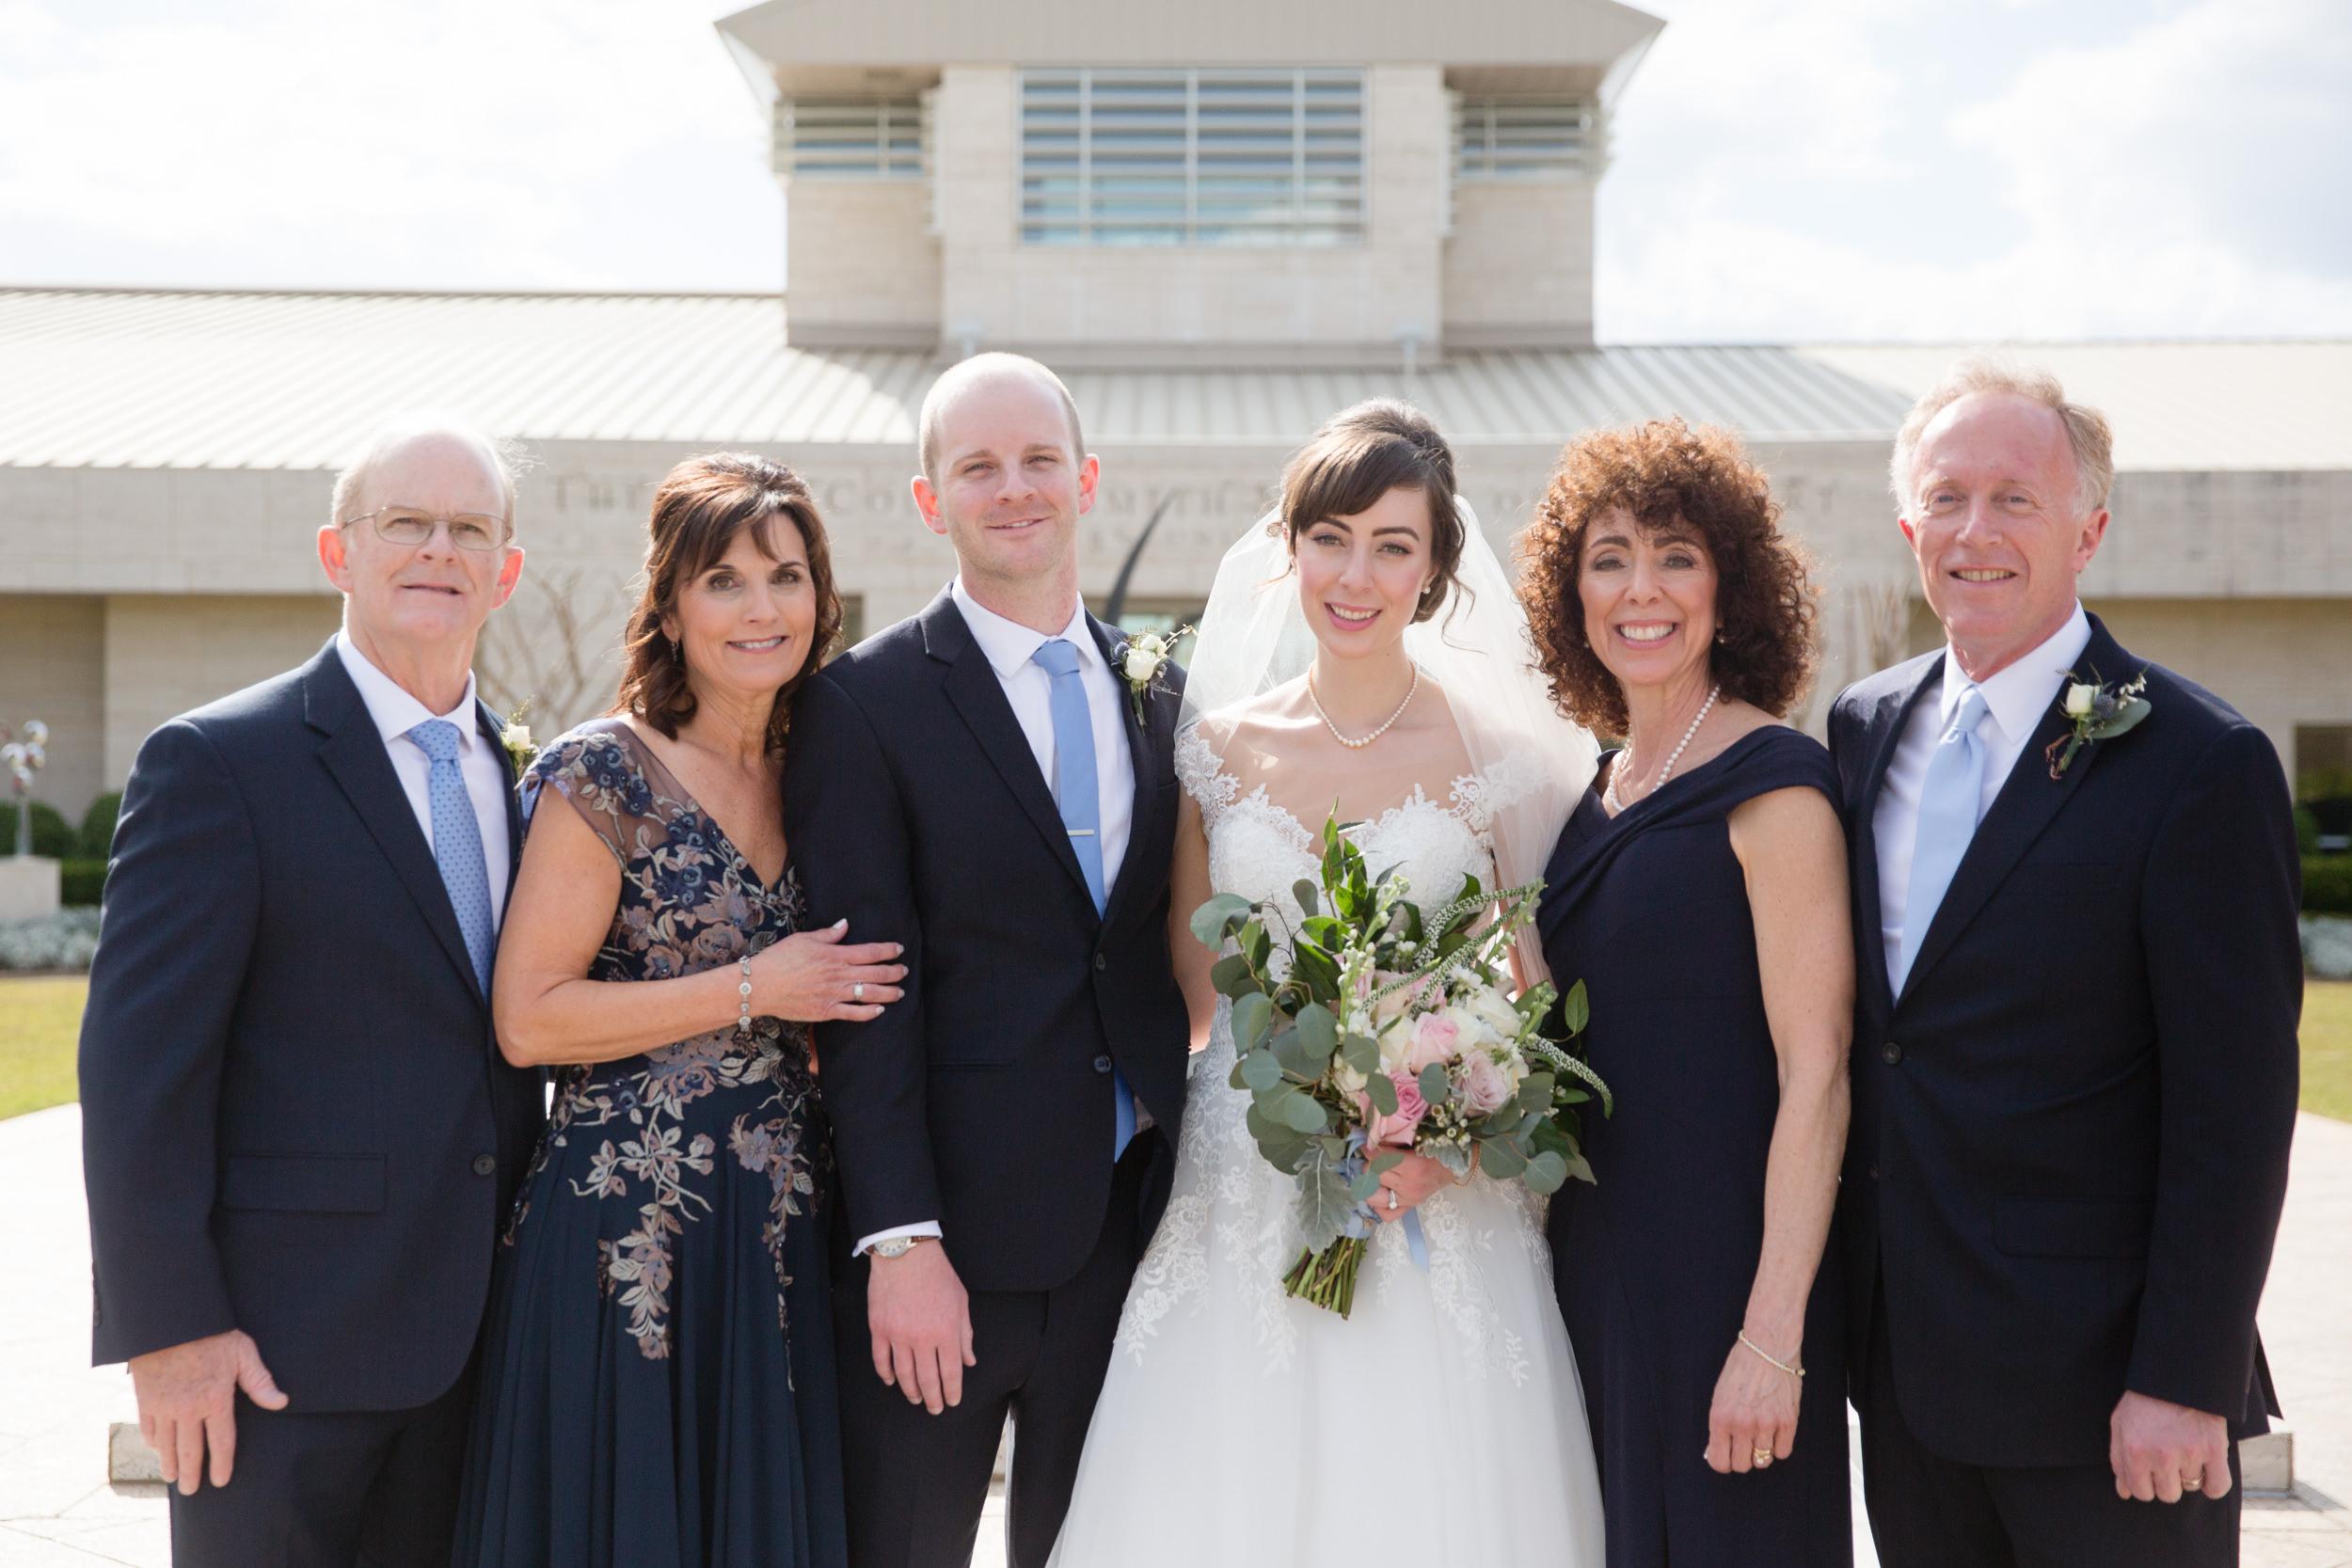 AB_Auburn_Wedding_2019-00041.jpg